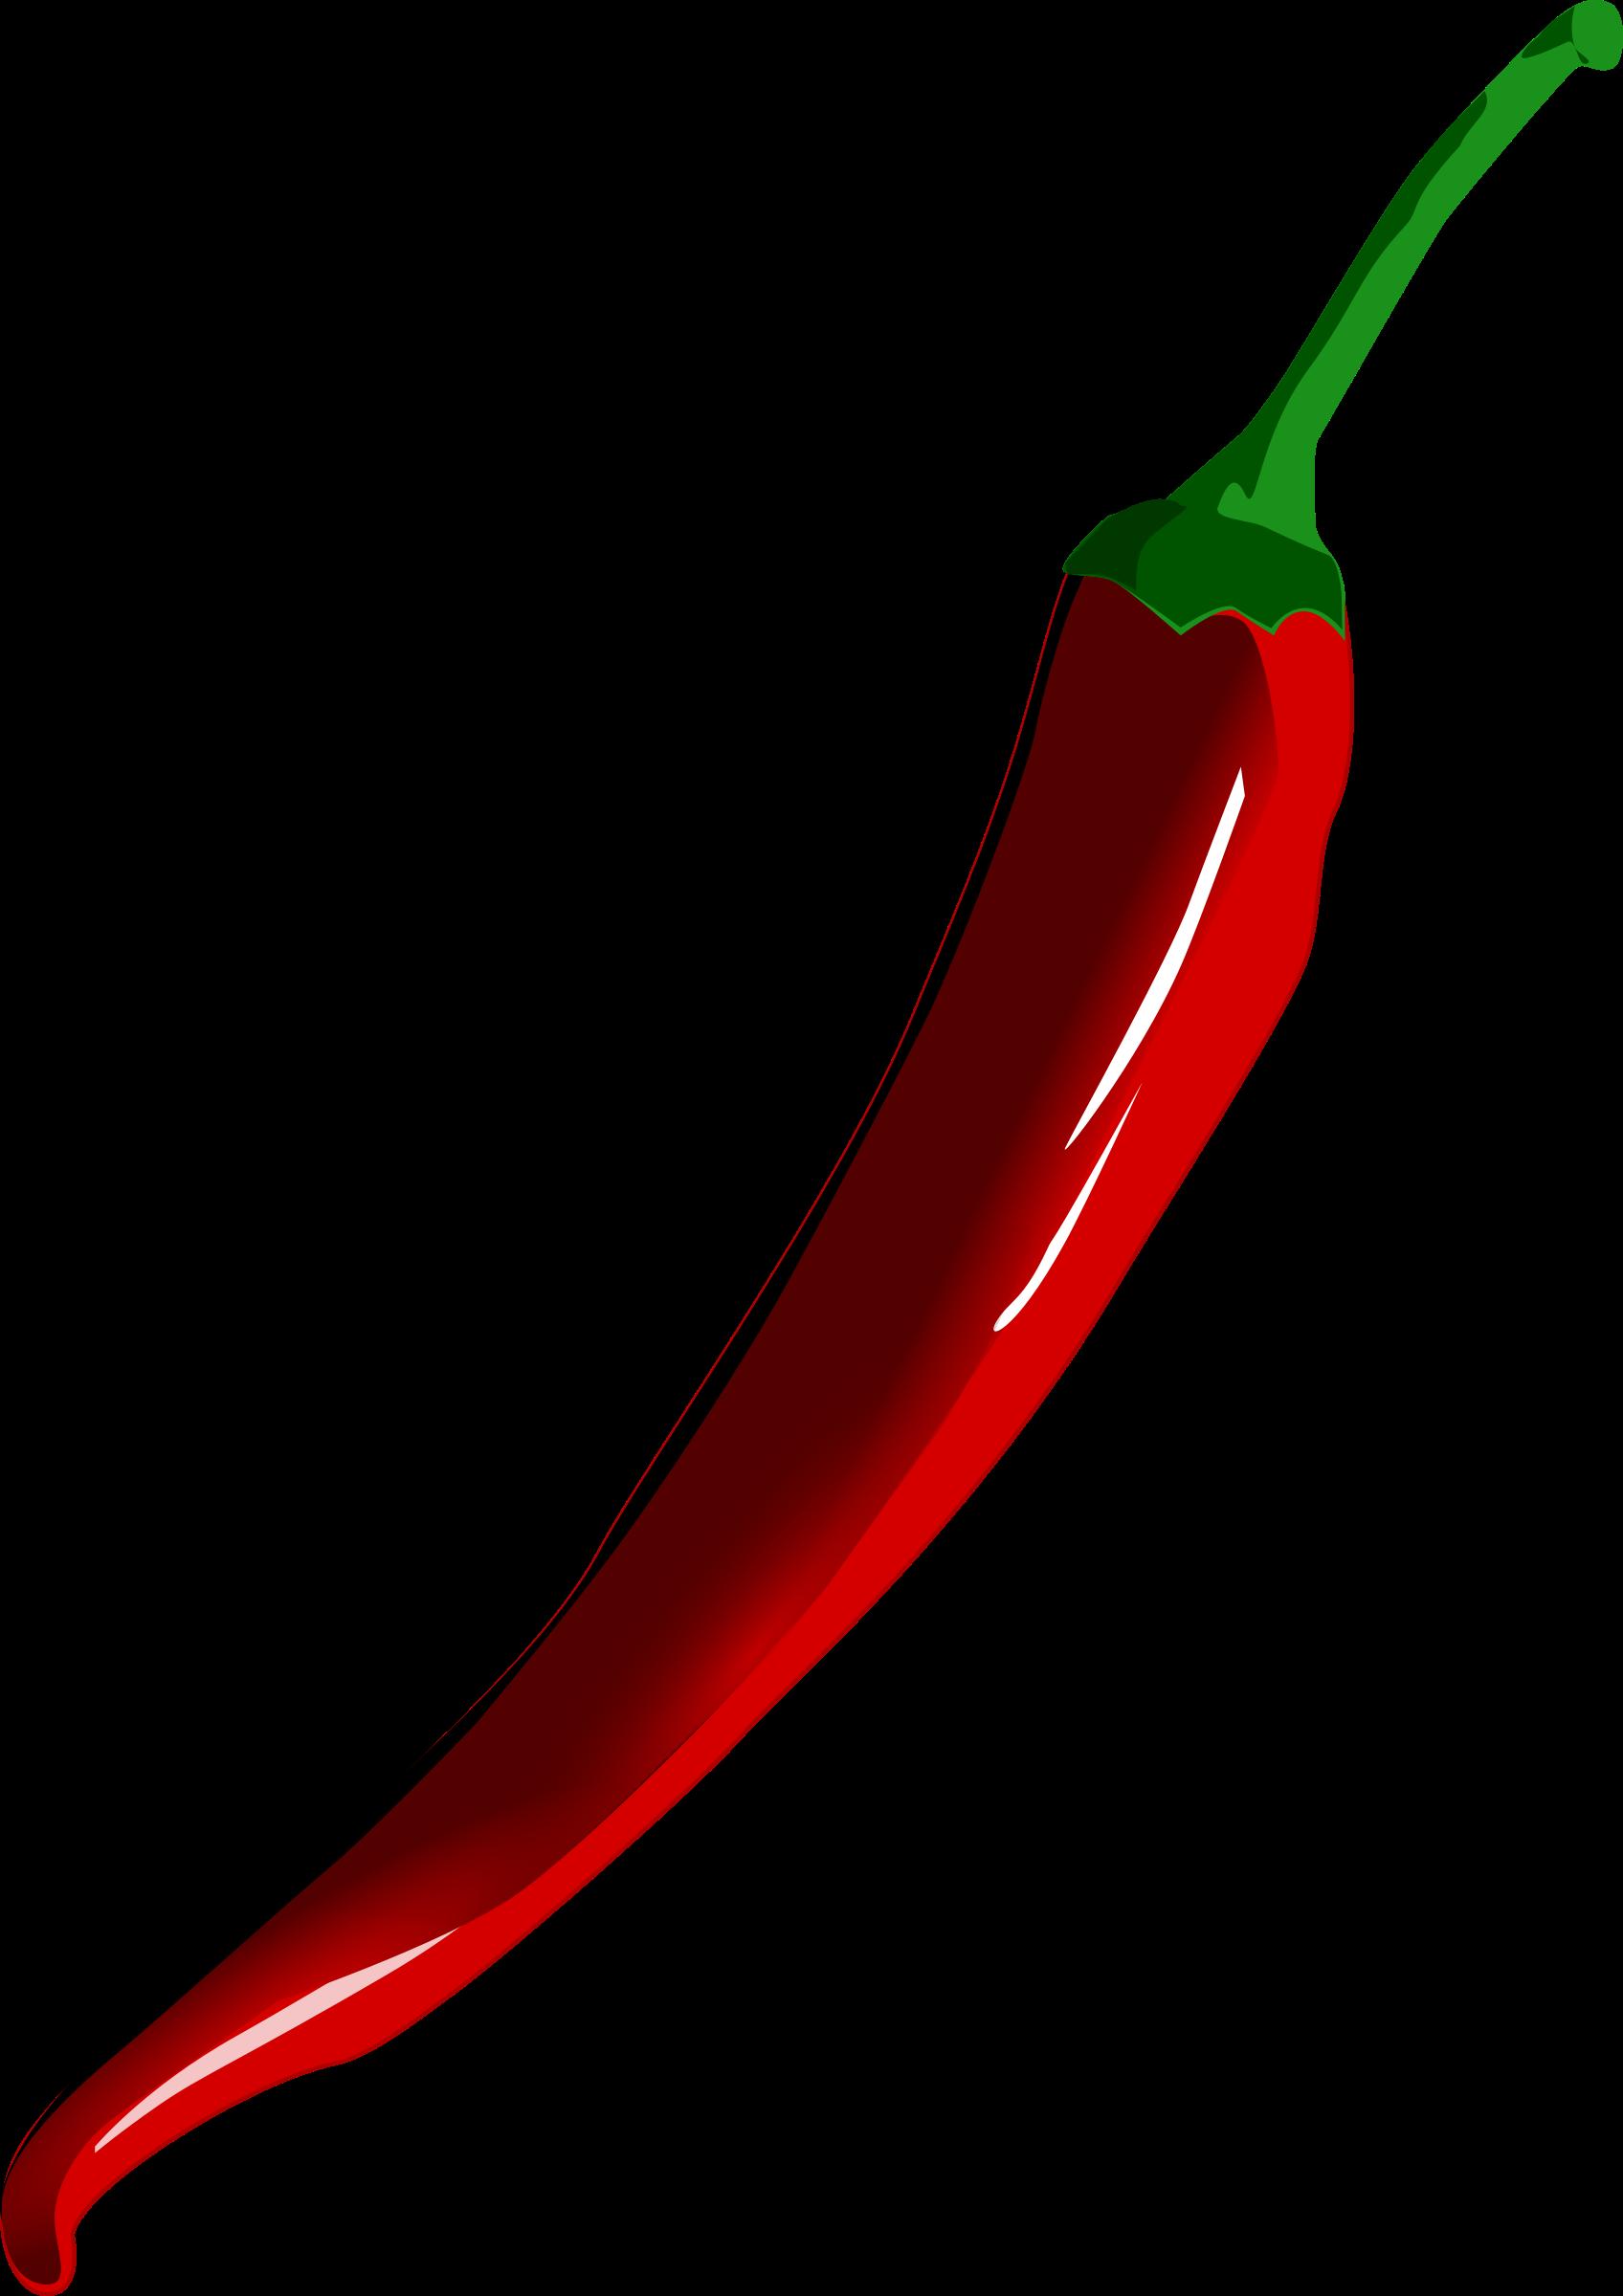 Chile clipart sili Chili pepper Chili Clipart pepper